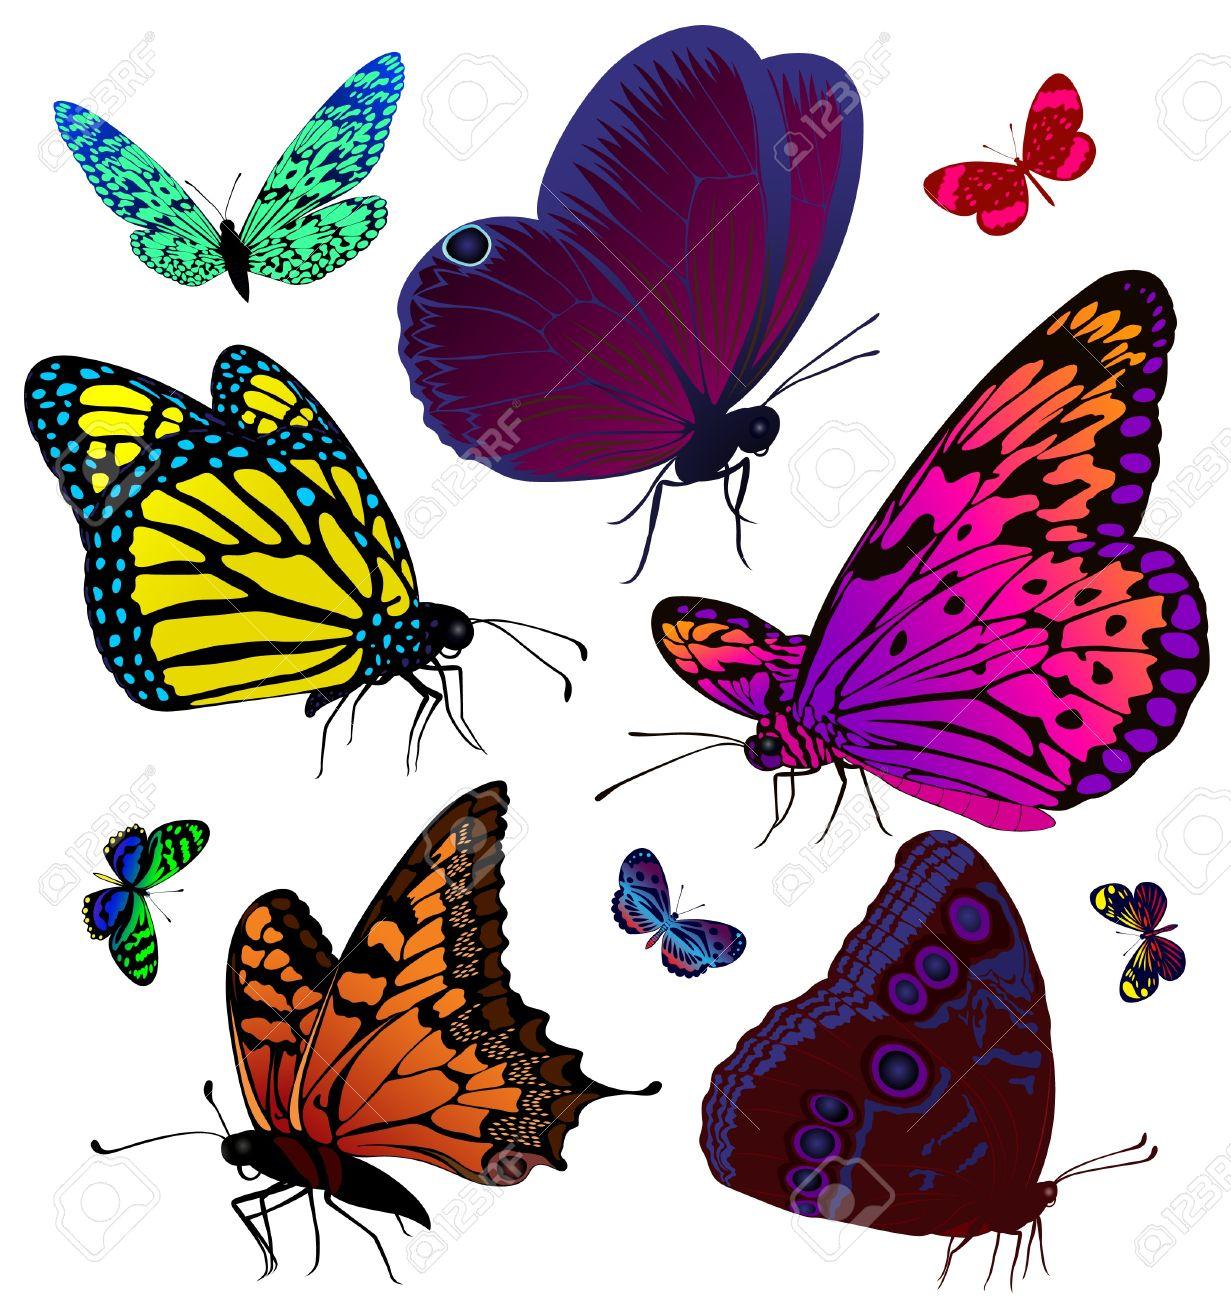 tatuaje mariposa imágenes de archivo vectores tatuaje mariposa